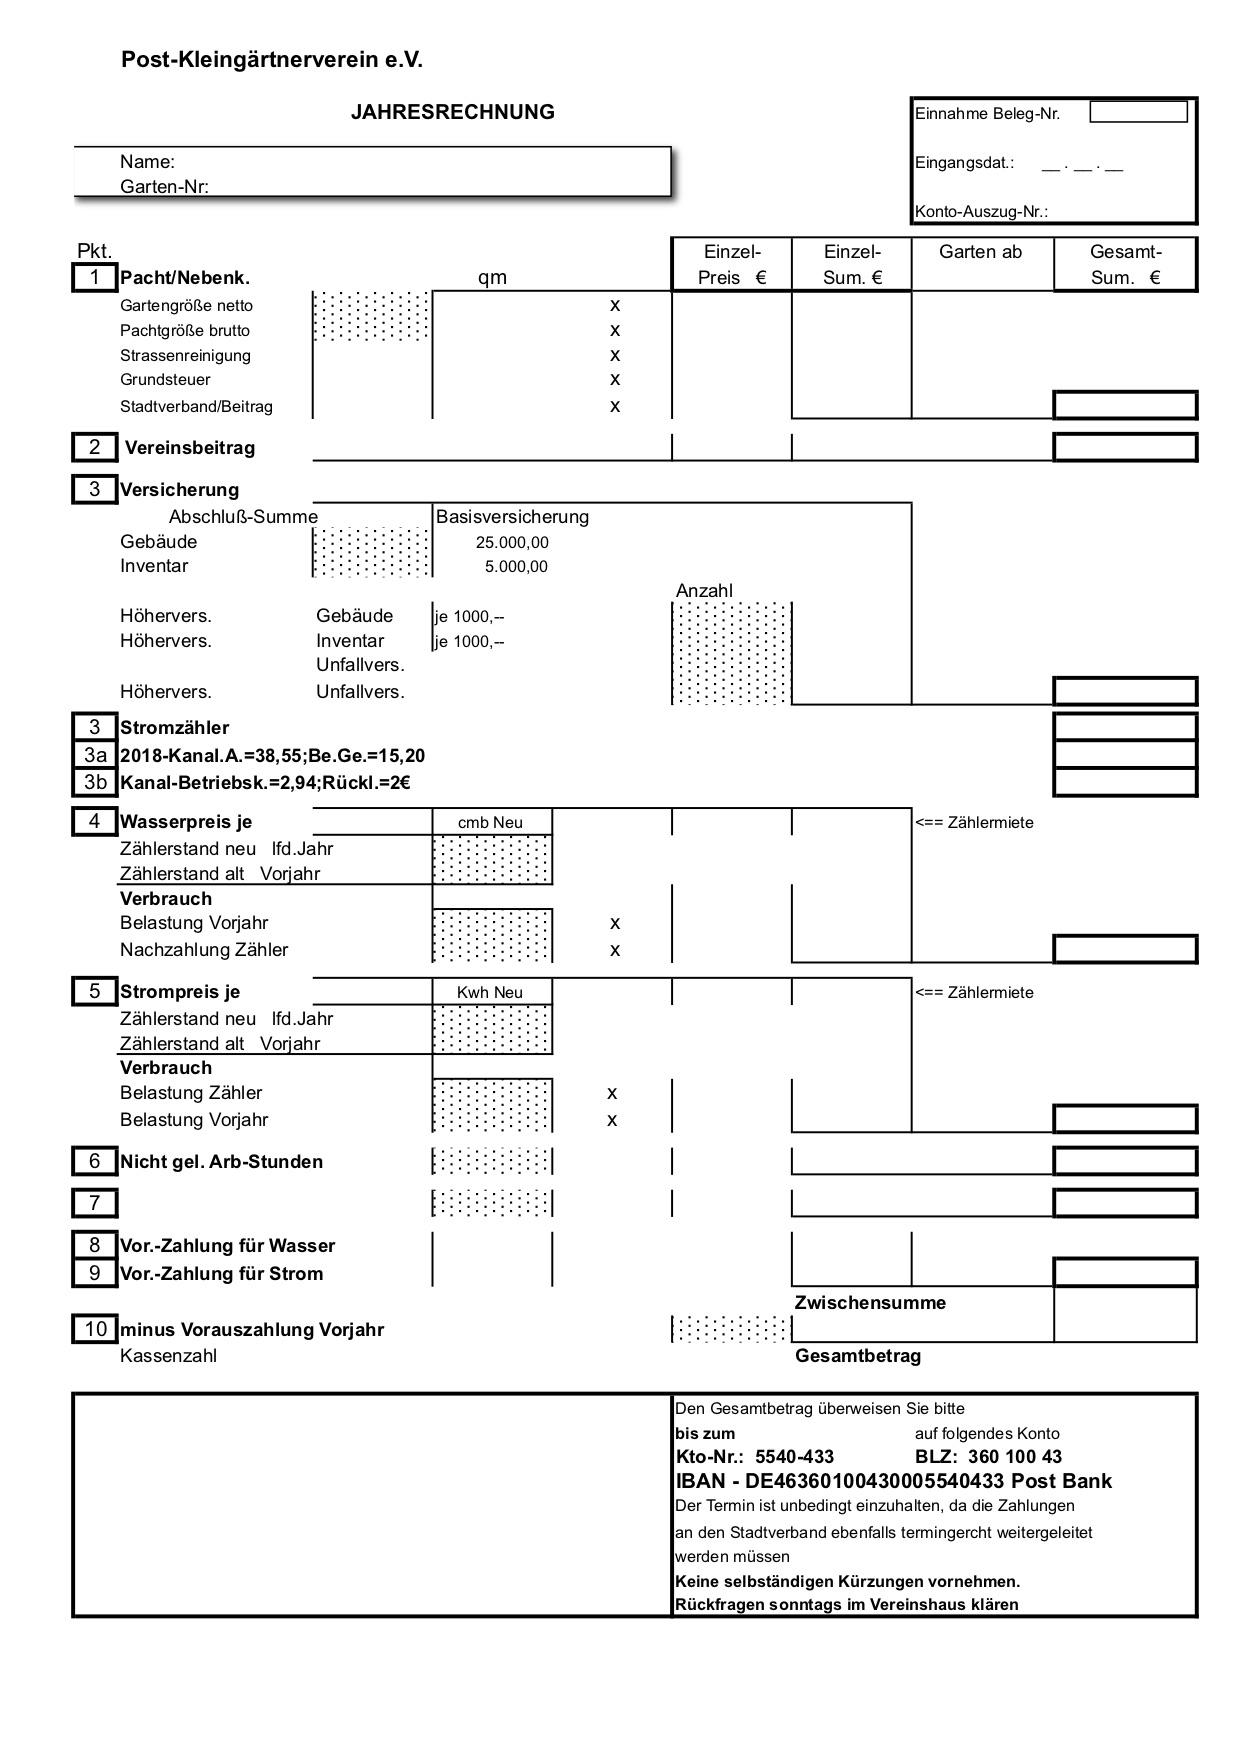 Abrechnungsformular 1999-2018